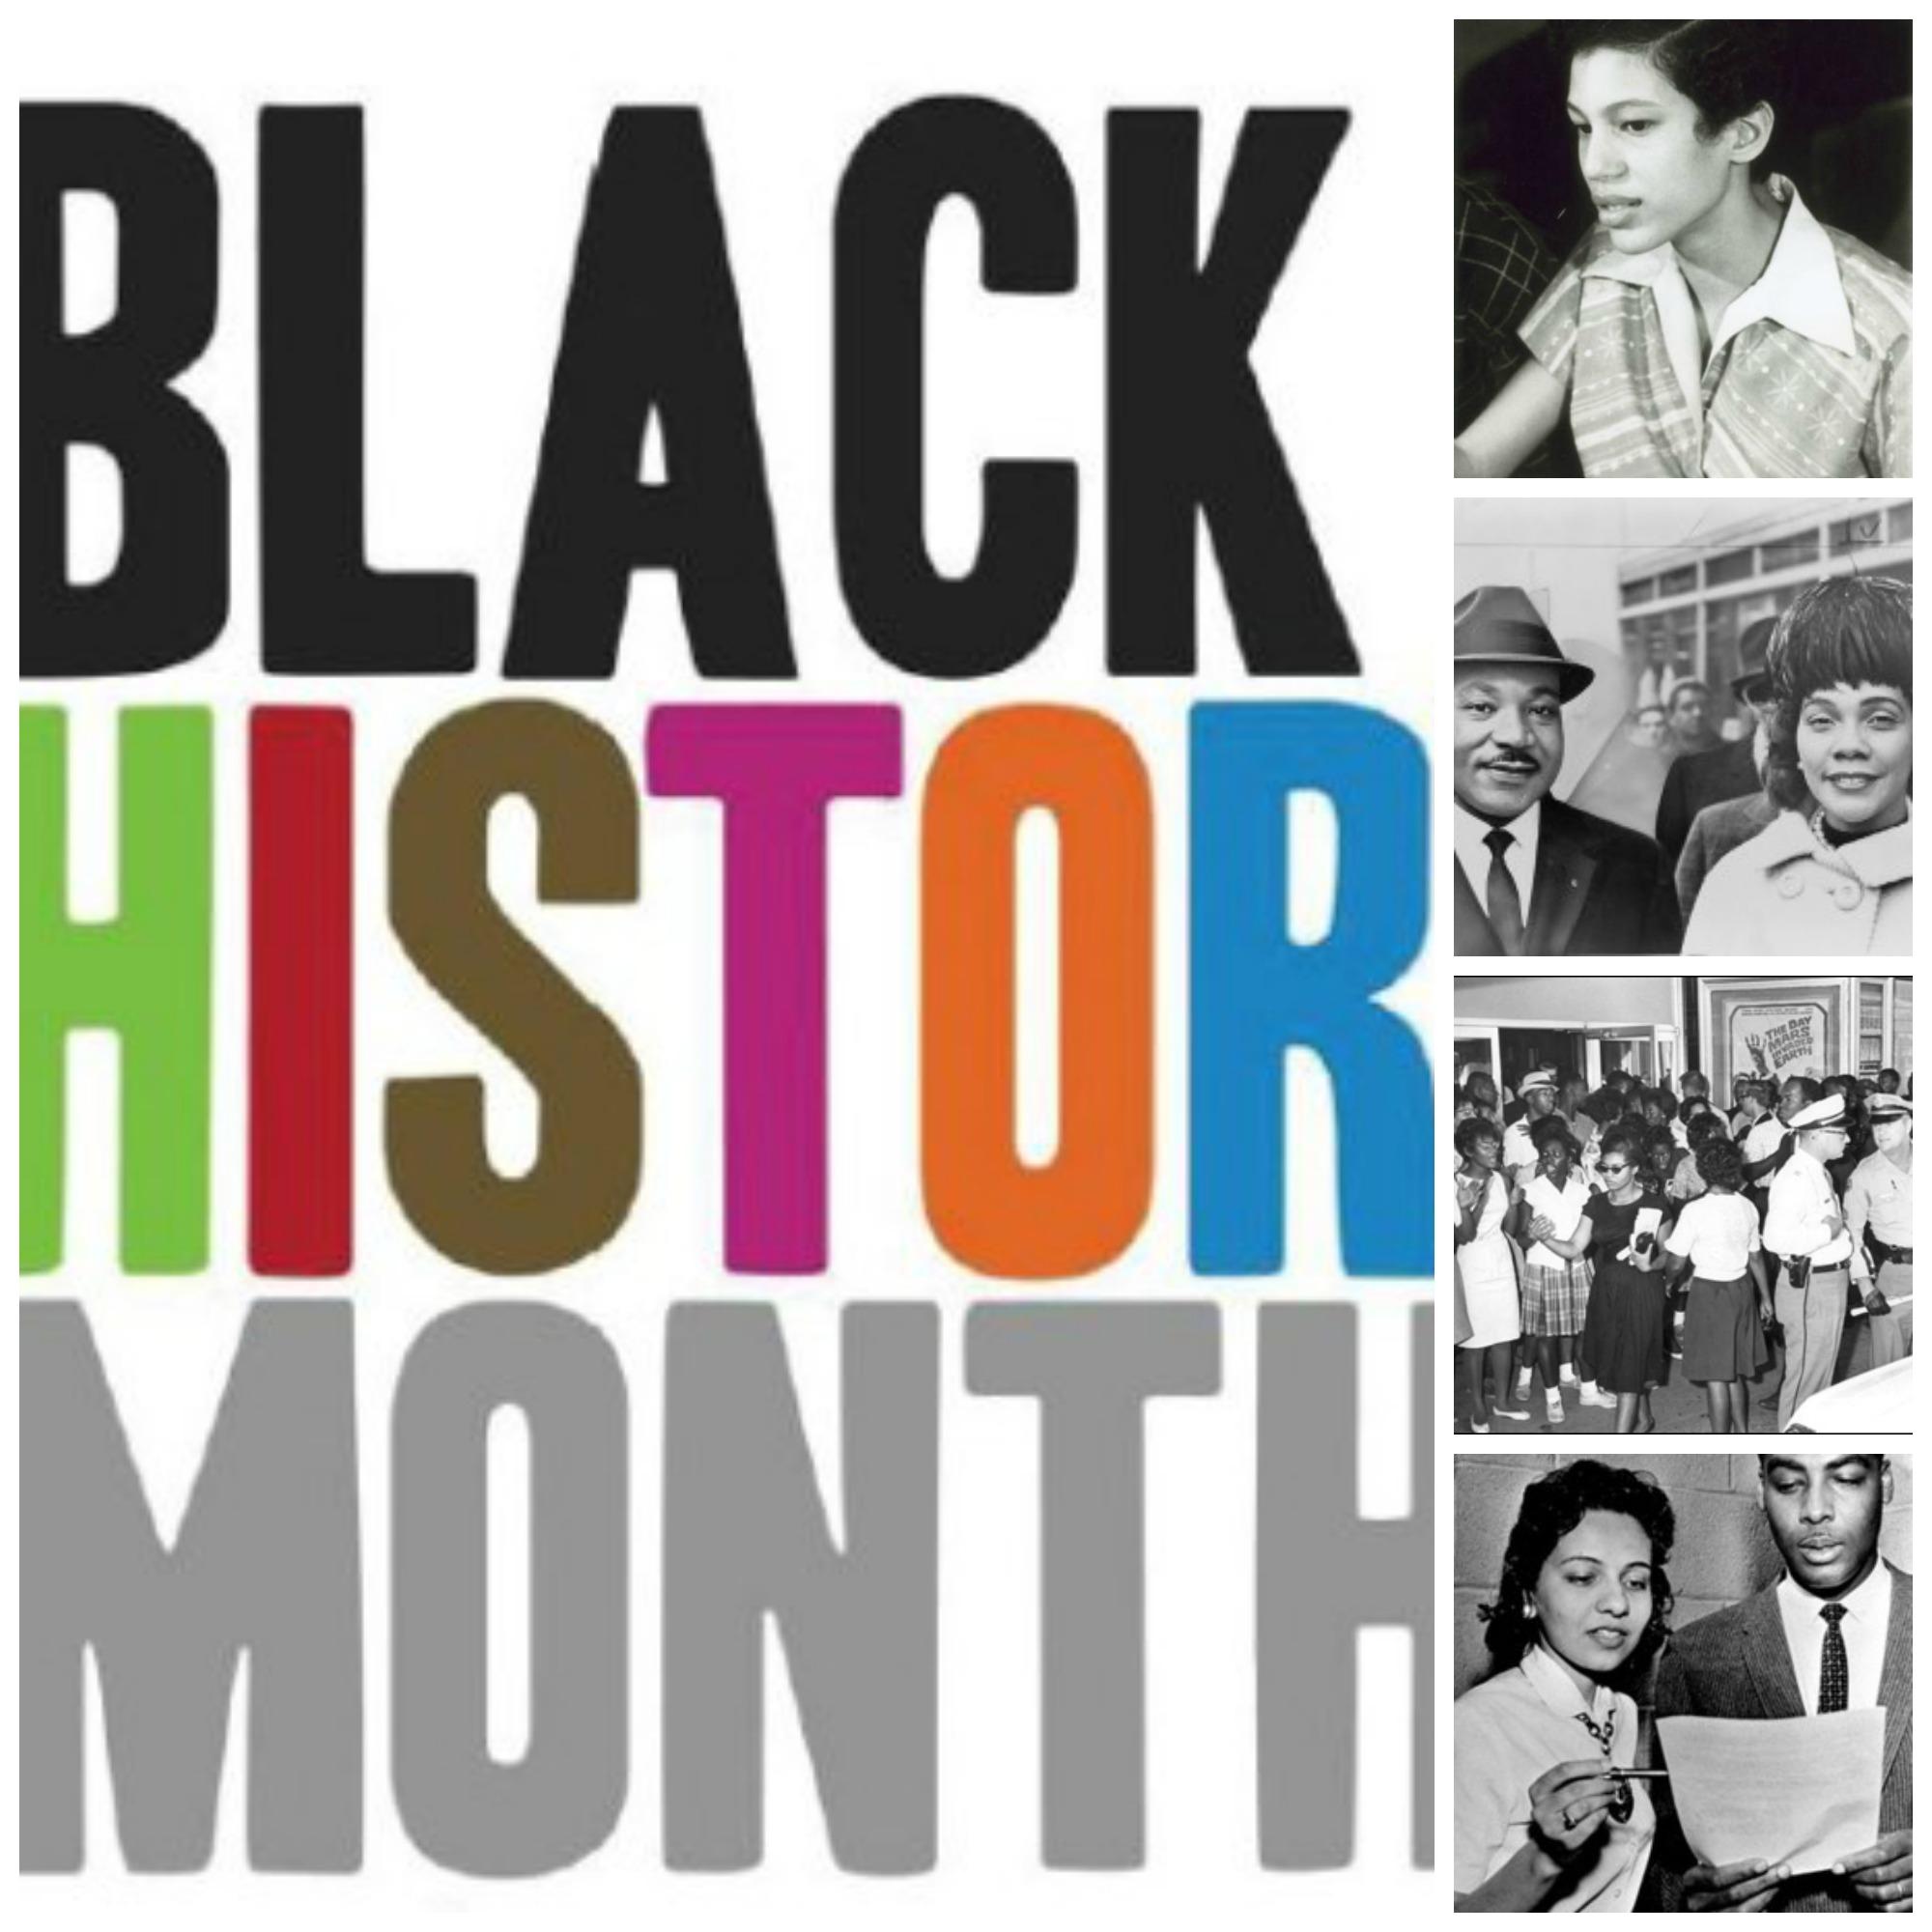 Celebrating black history month with black love 4